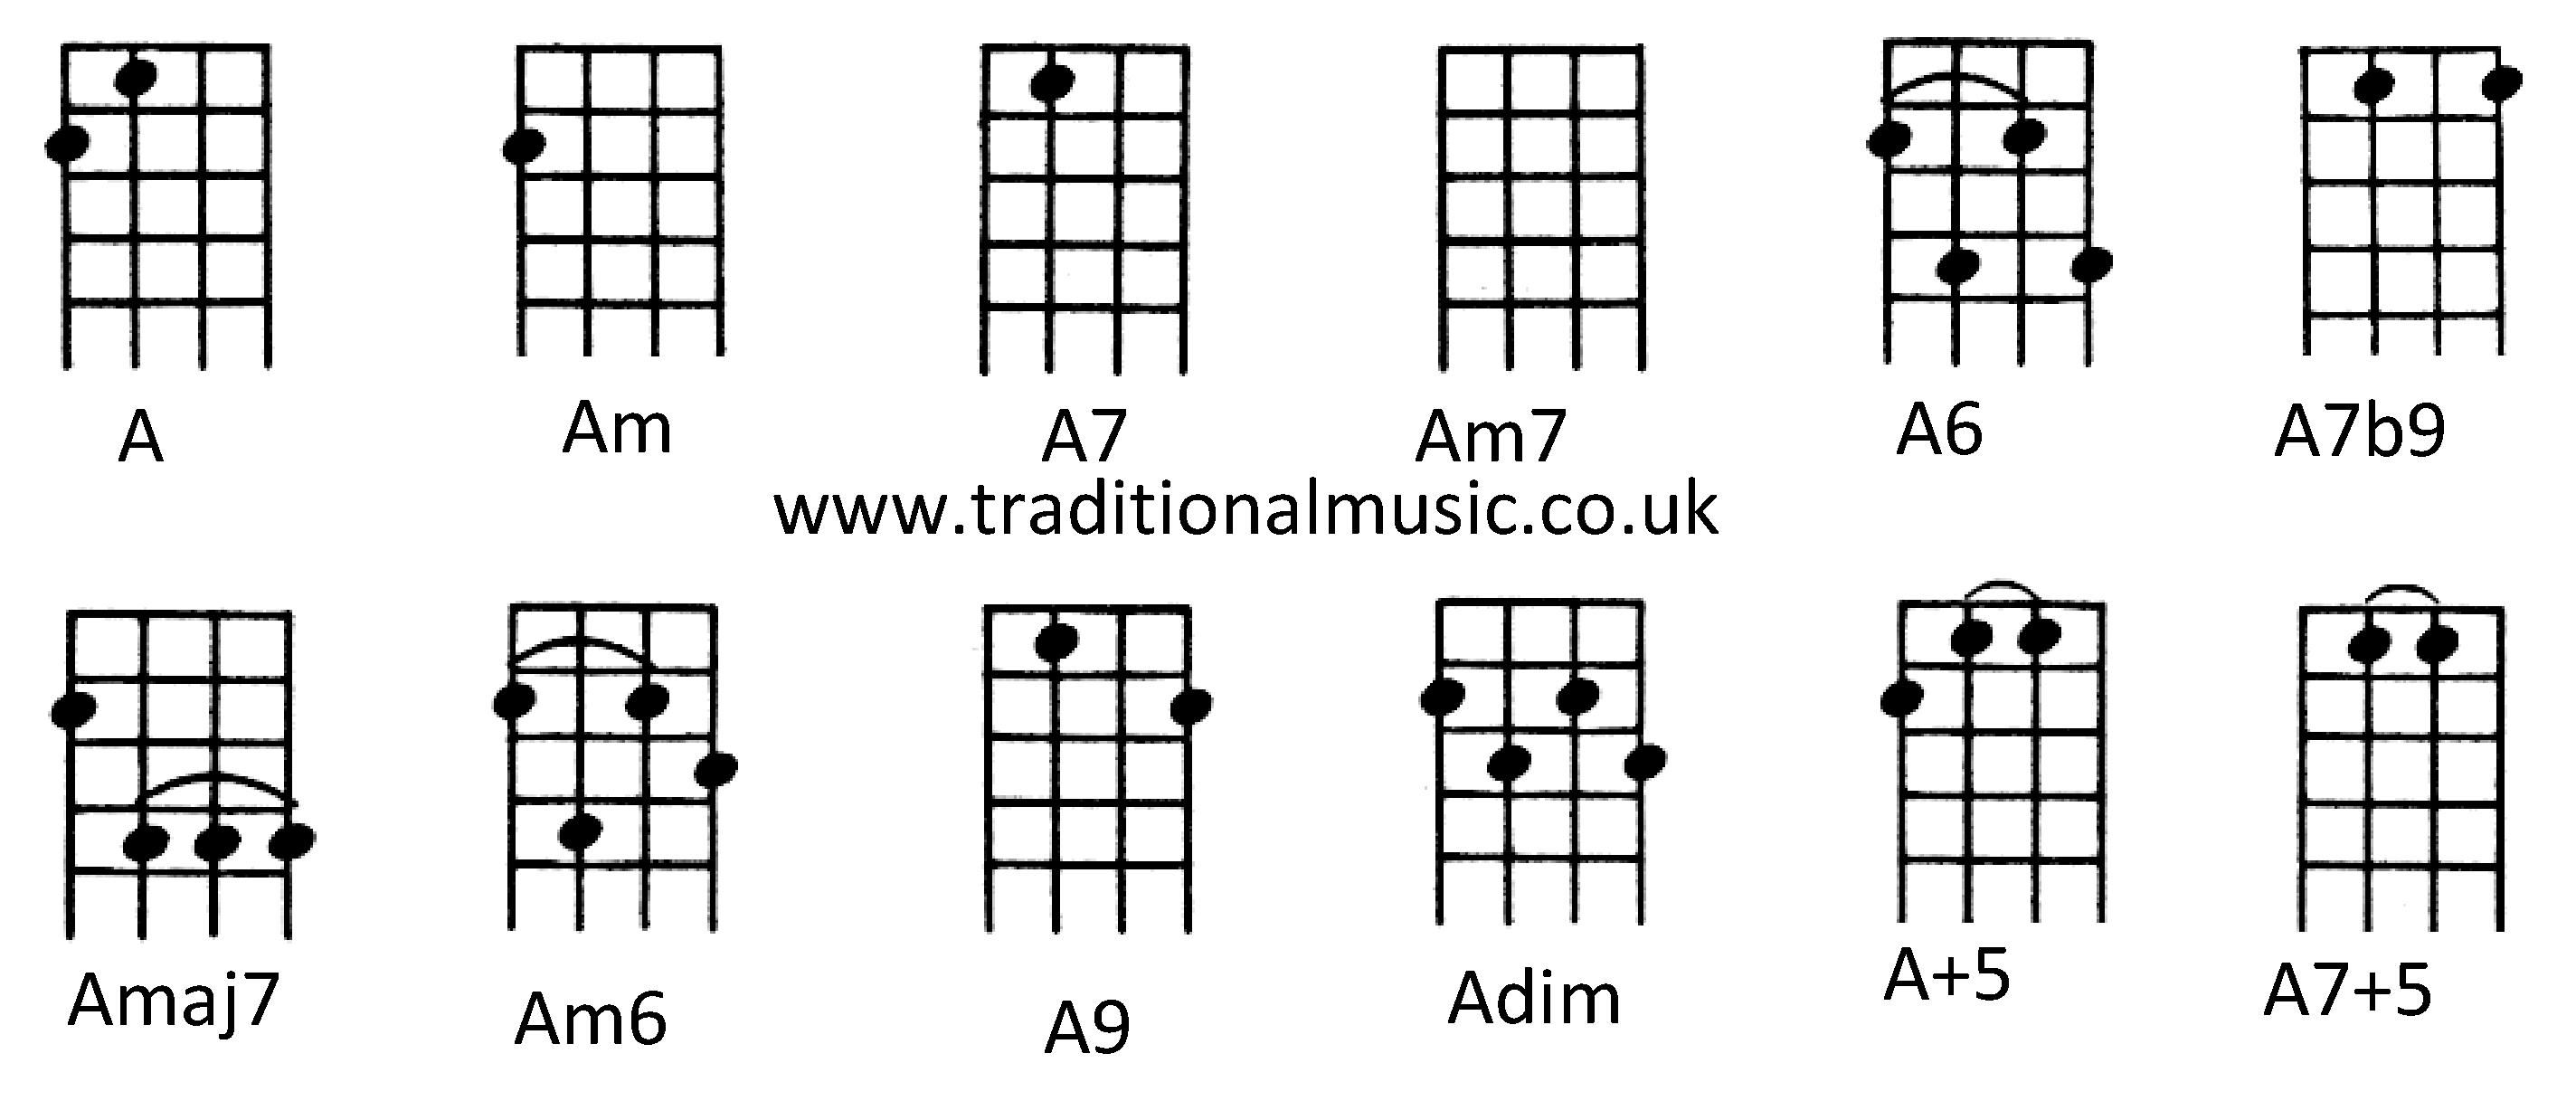 Chords for Ukulele (C tuning) A Am A7 Am7 A6 Amaj7 Am6 A9